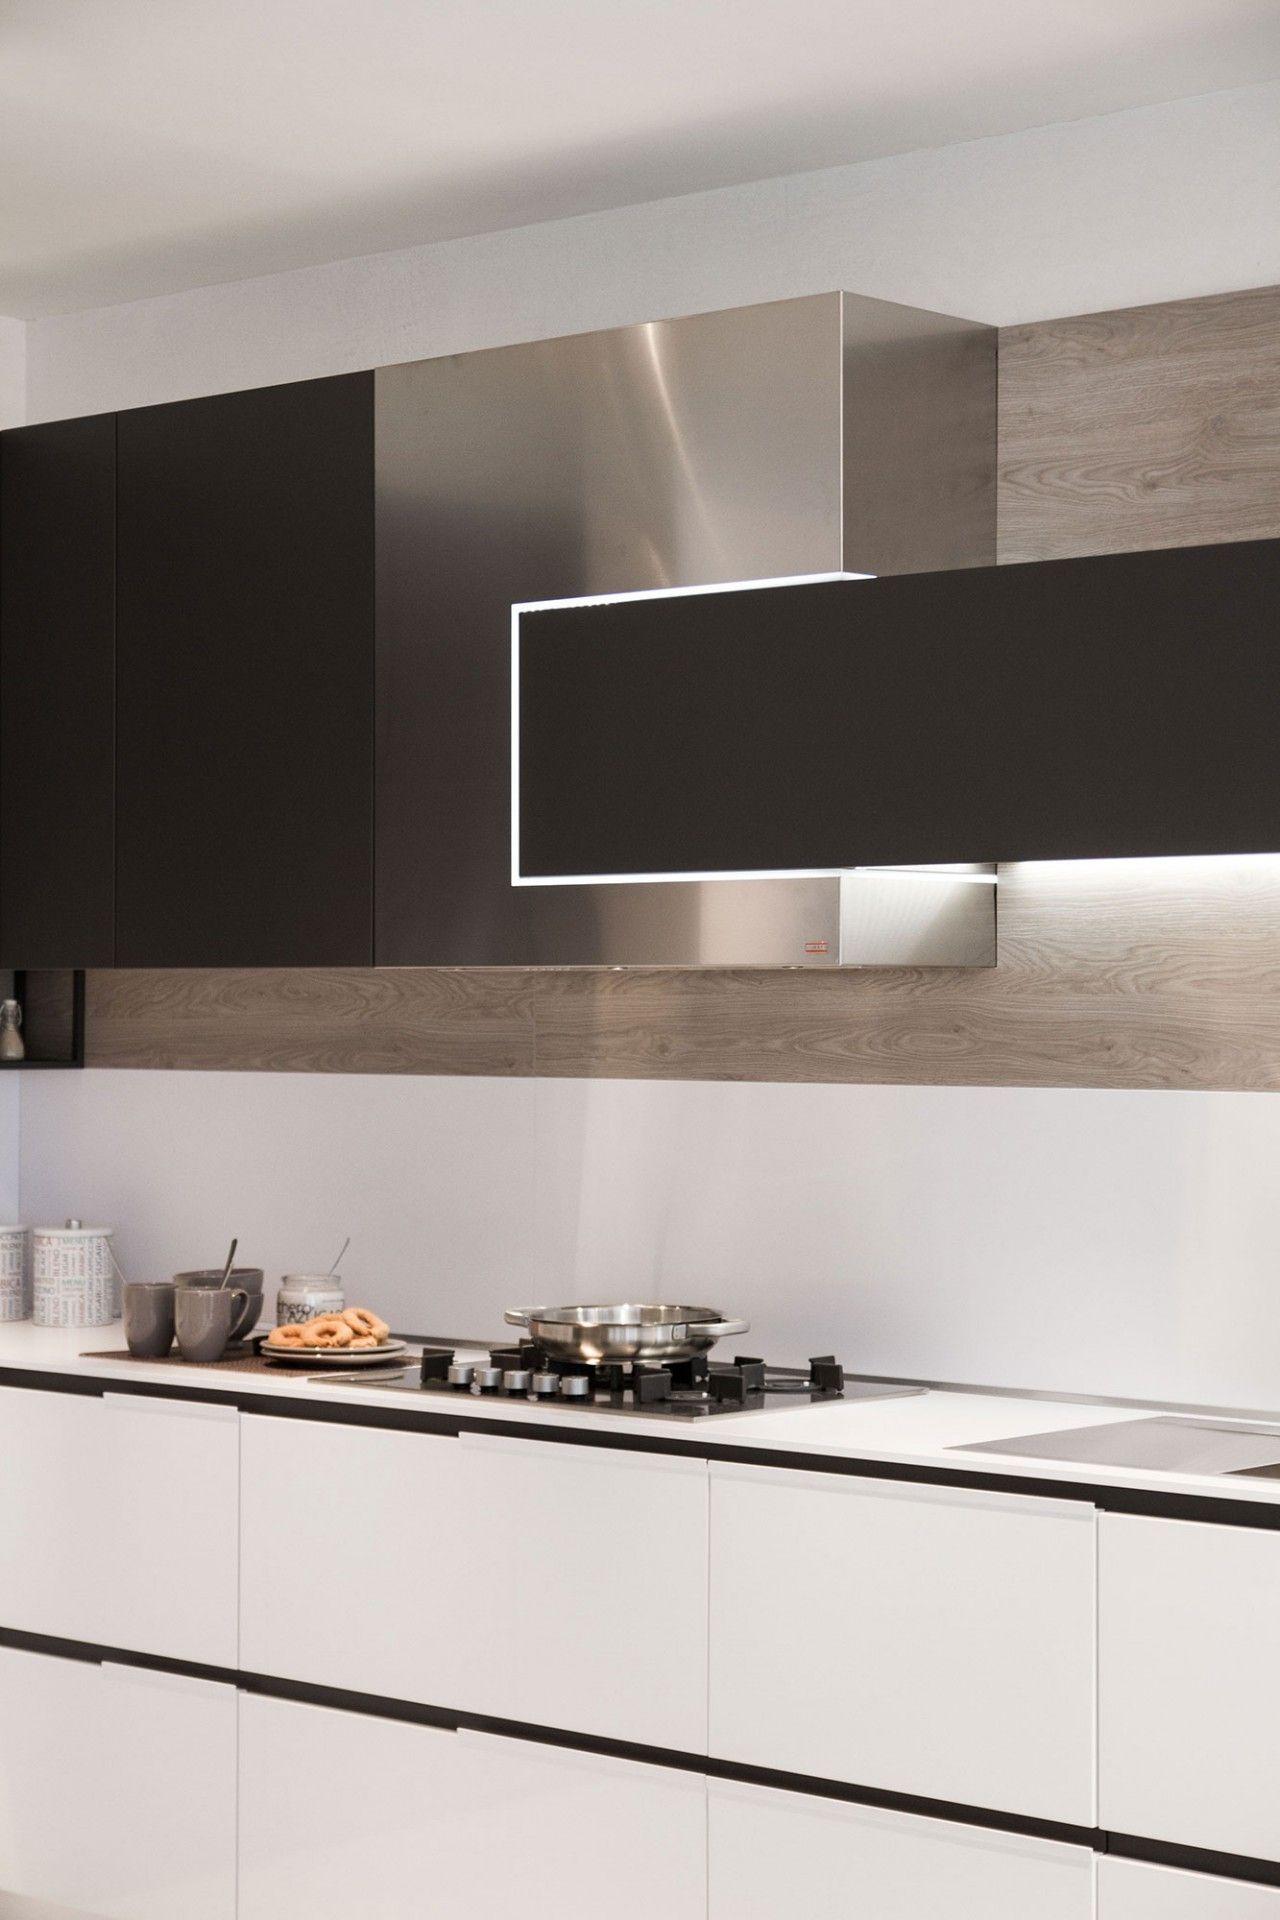 Cucine Piccole Ad Angolo Cucine Angolari Moderne Snaidero Kitchen Inspiration Modern Kitchen Interior Inspiration Luxury Kitchen Design